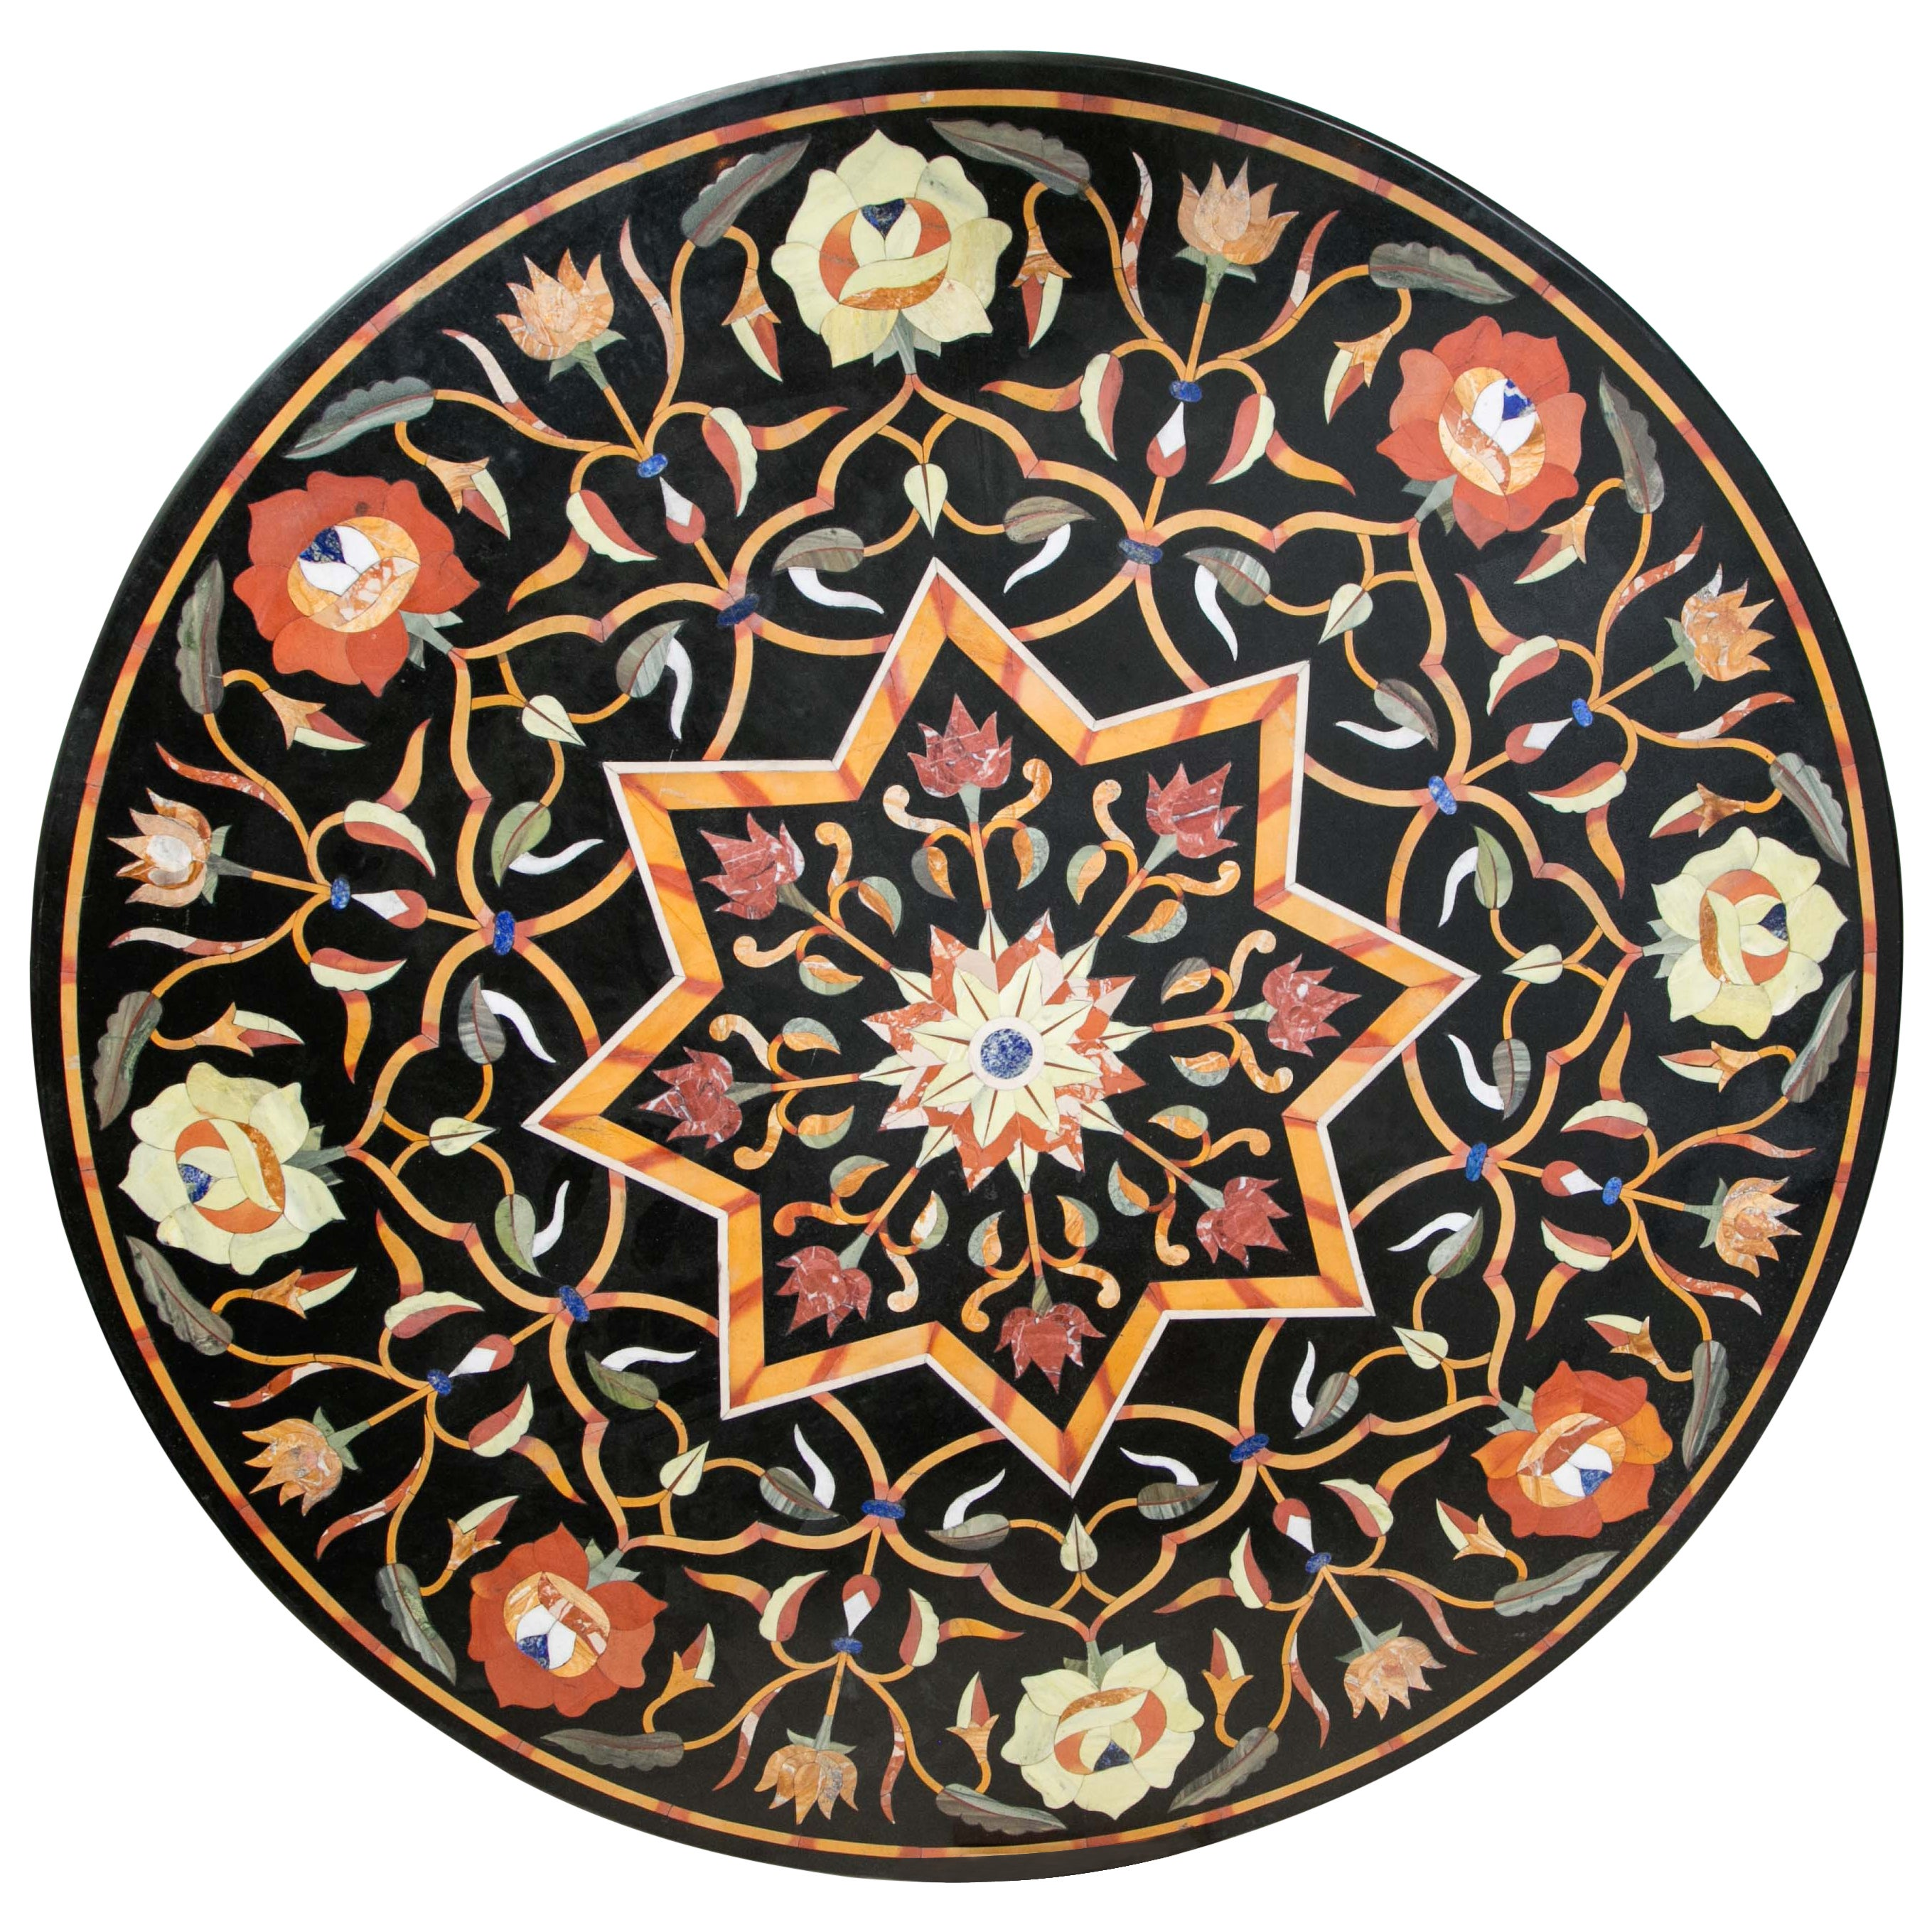 Black Marble Ground Pietra Dura Tabletop